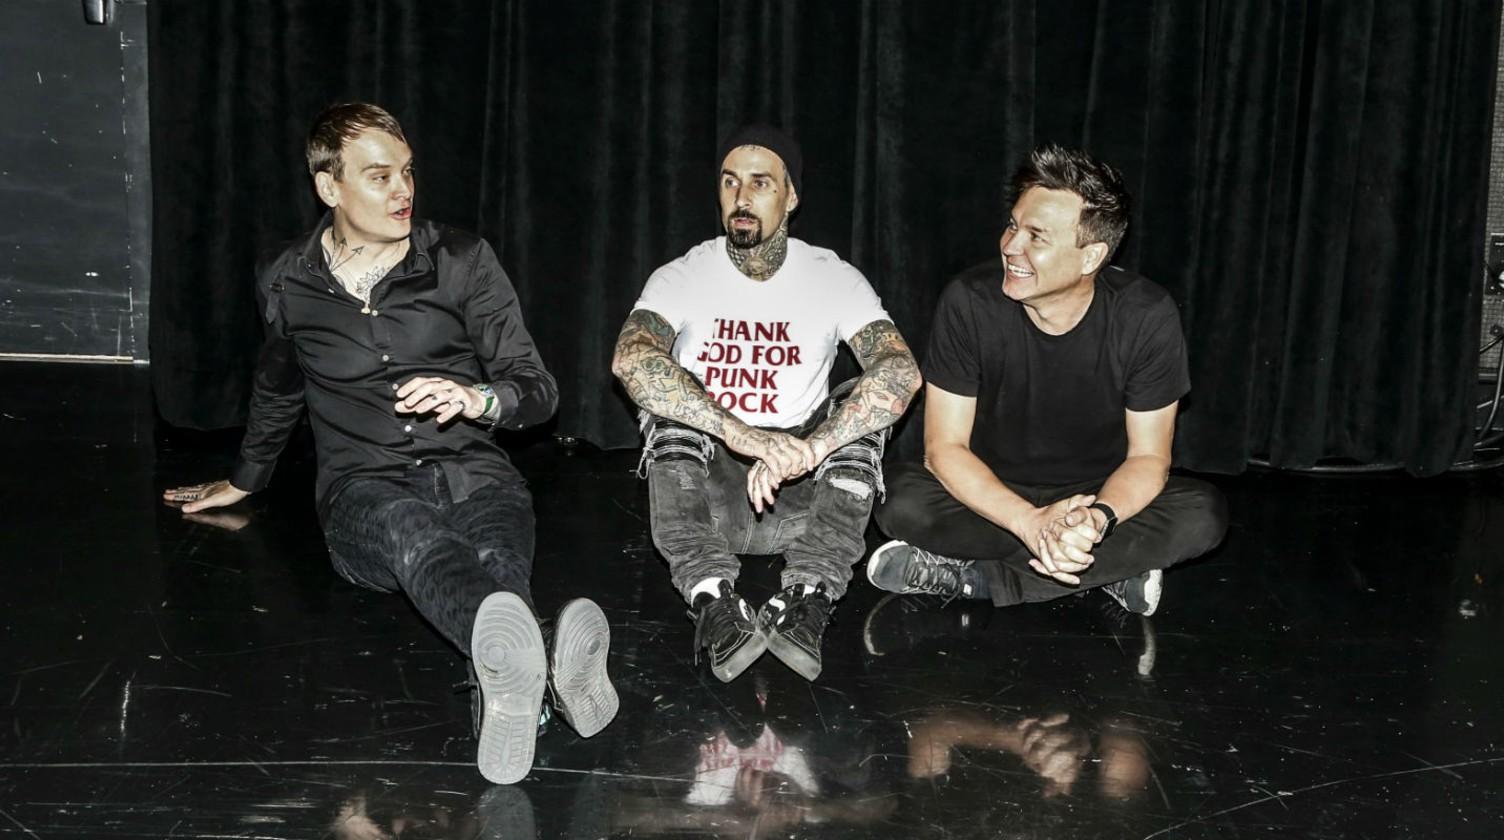 Blink-182 Apparently to Feature on Posthumous XXXTentacion Album